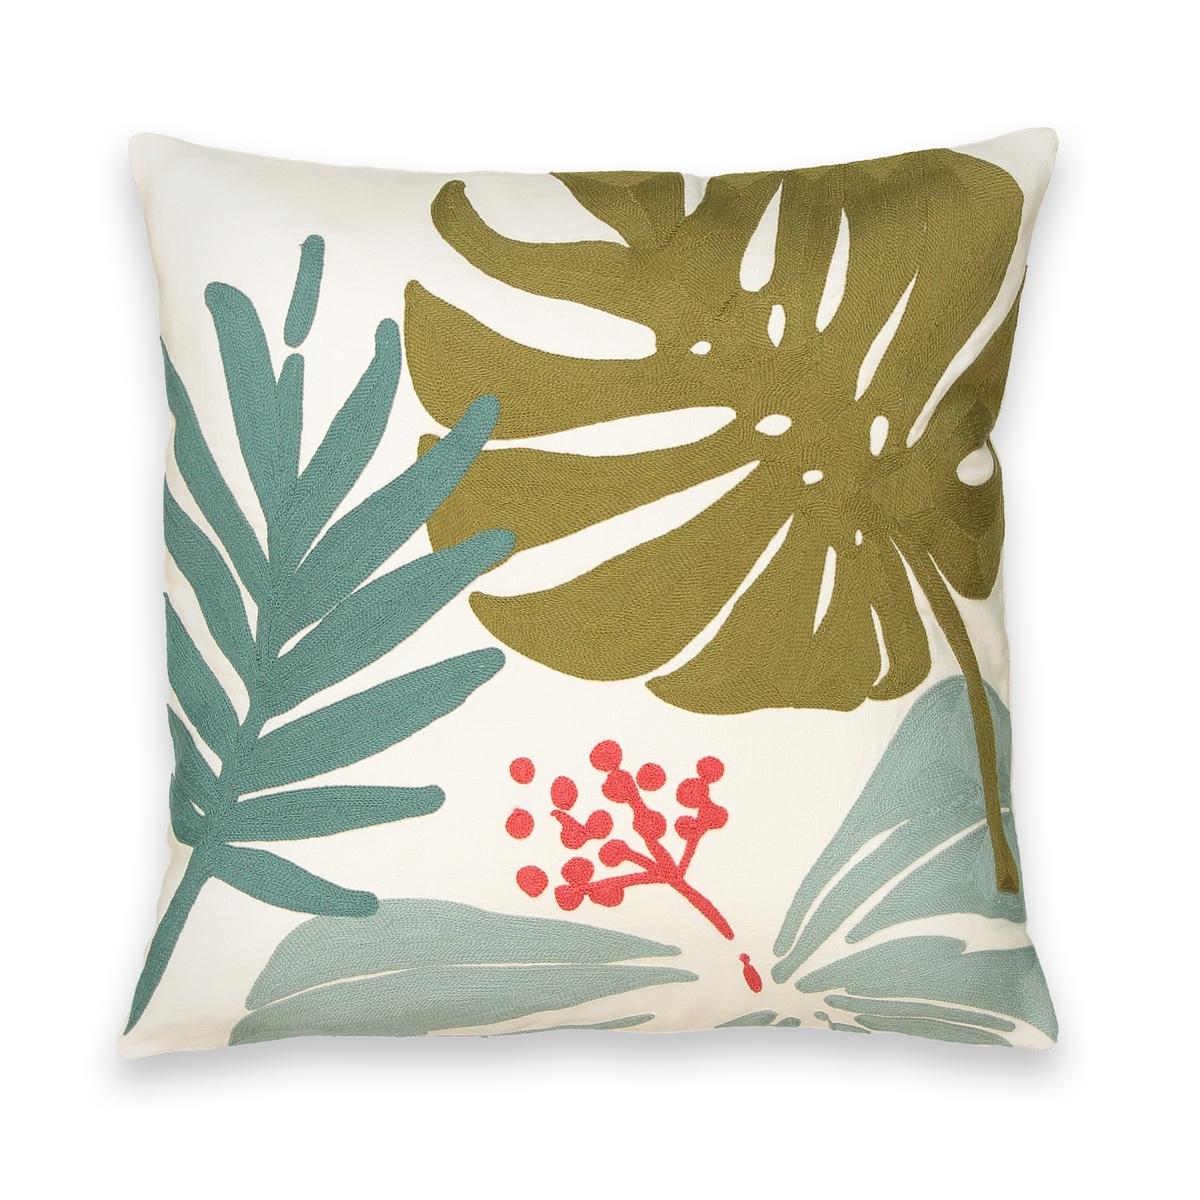 Чехол La Redoute На подушку с вышивкой BRAZILIA 45 x 45 см разноцветный цена